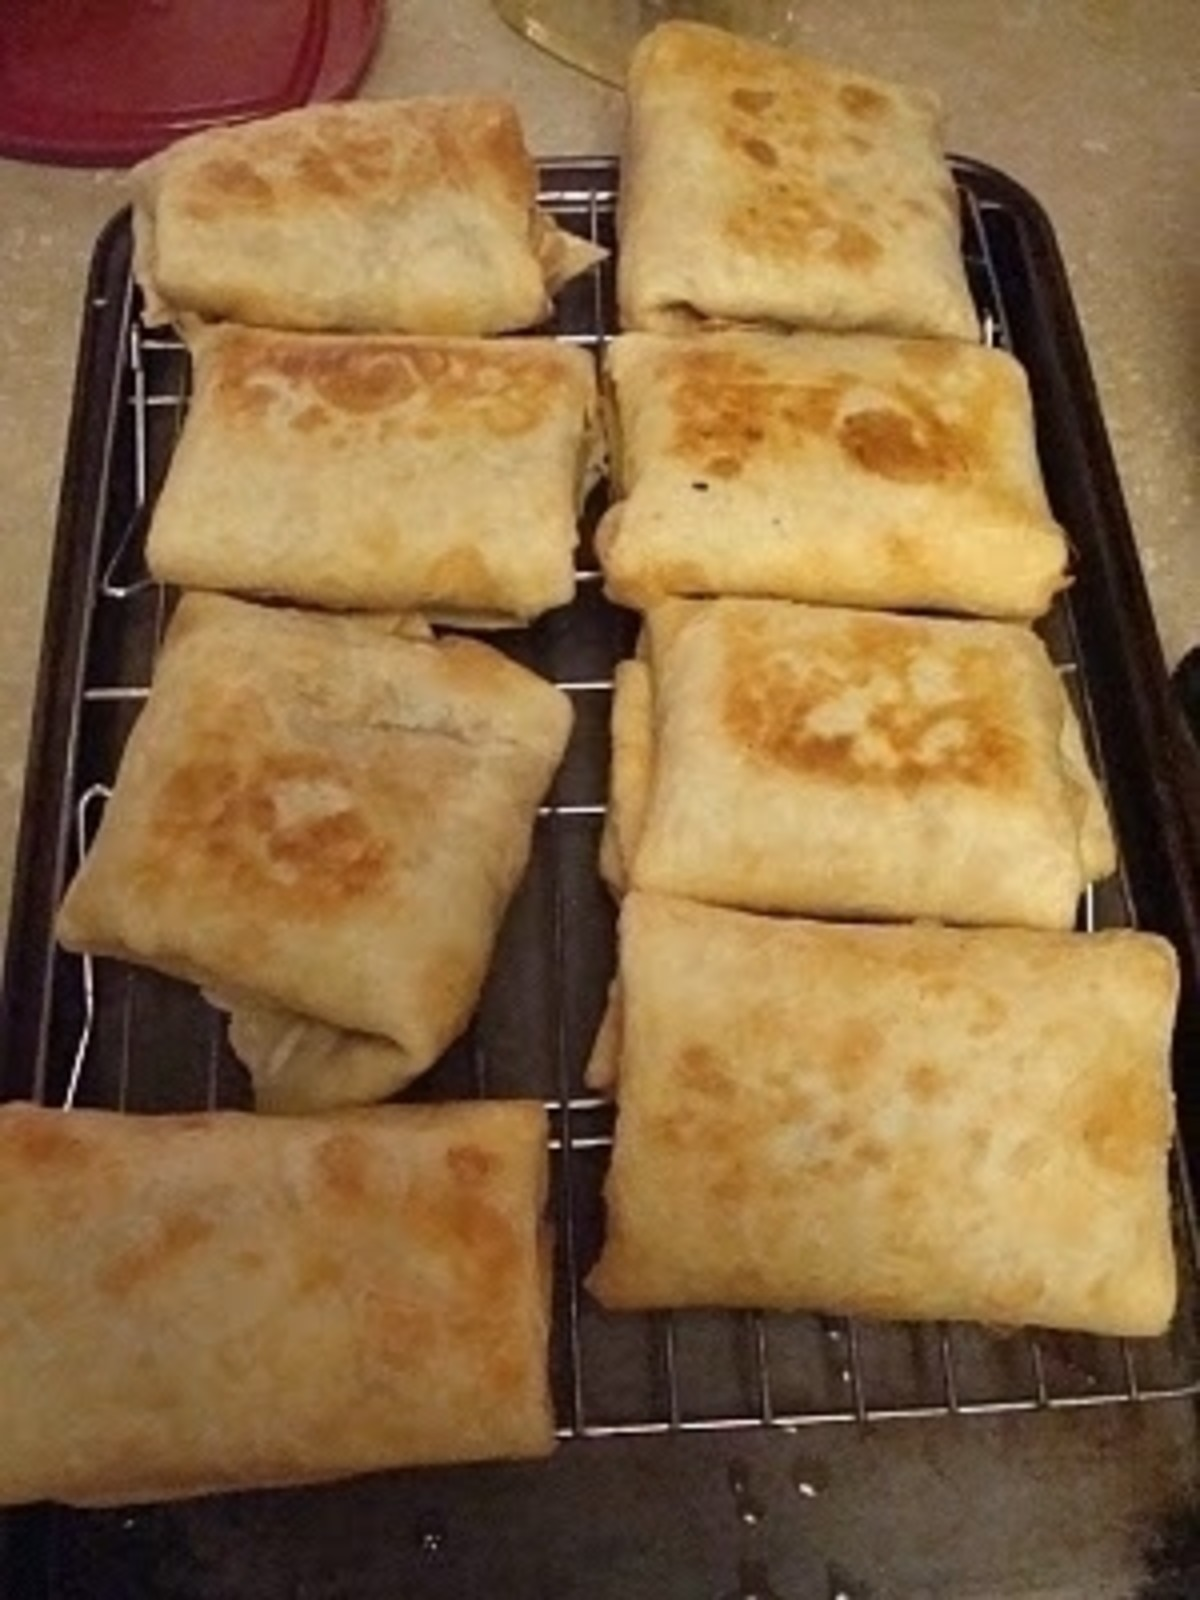 baked chimichangas